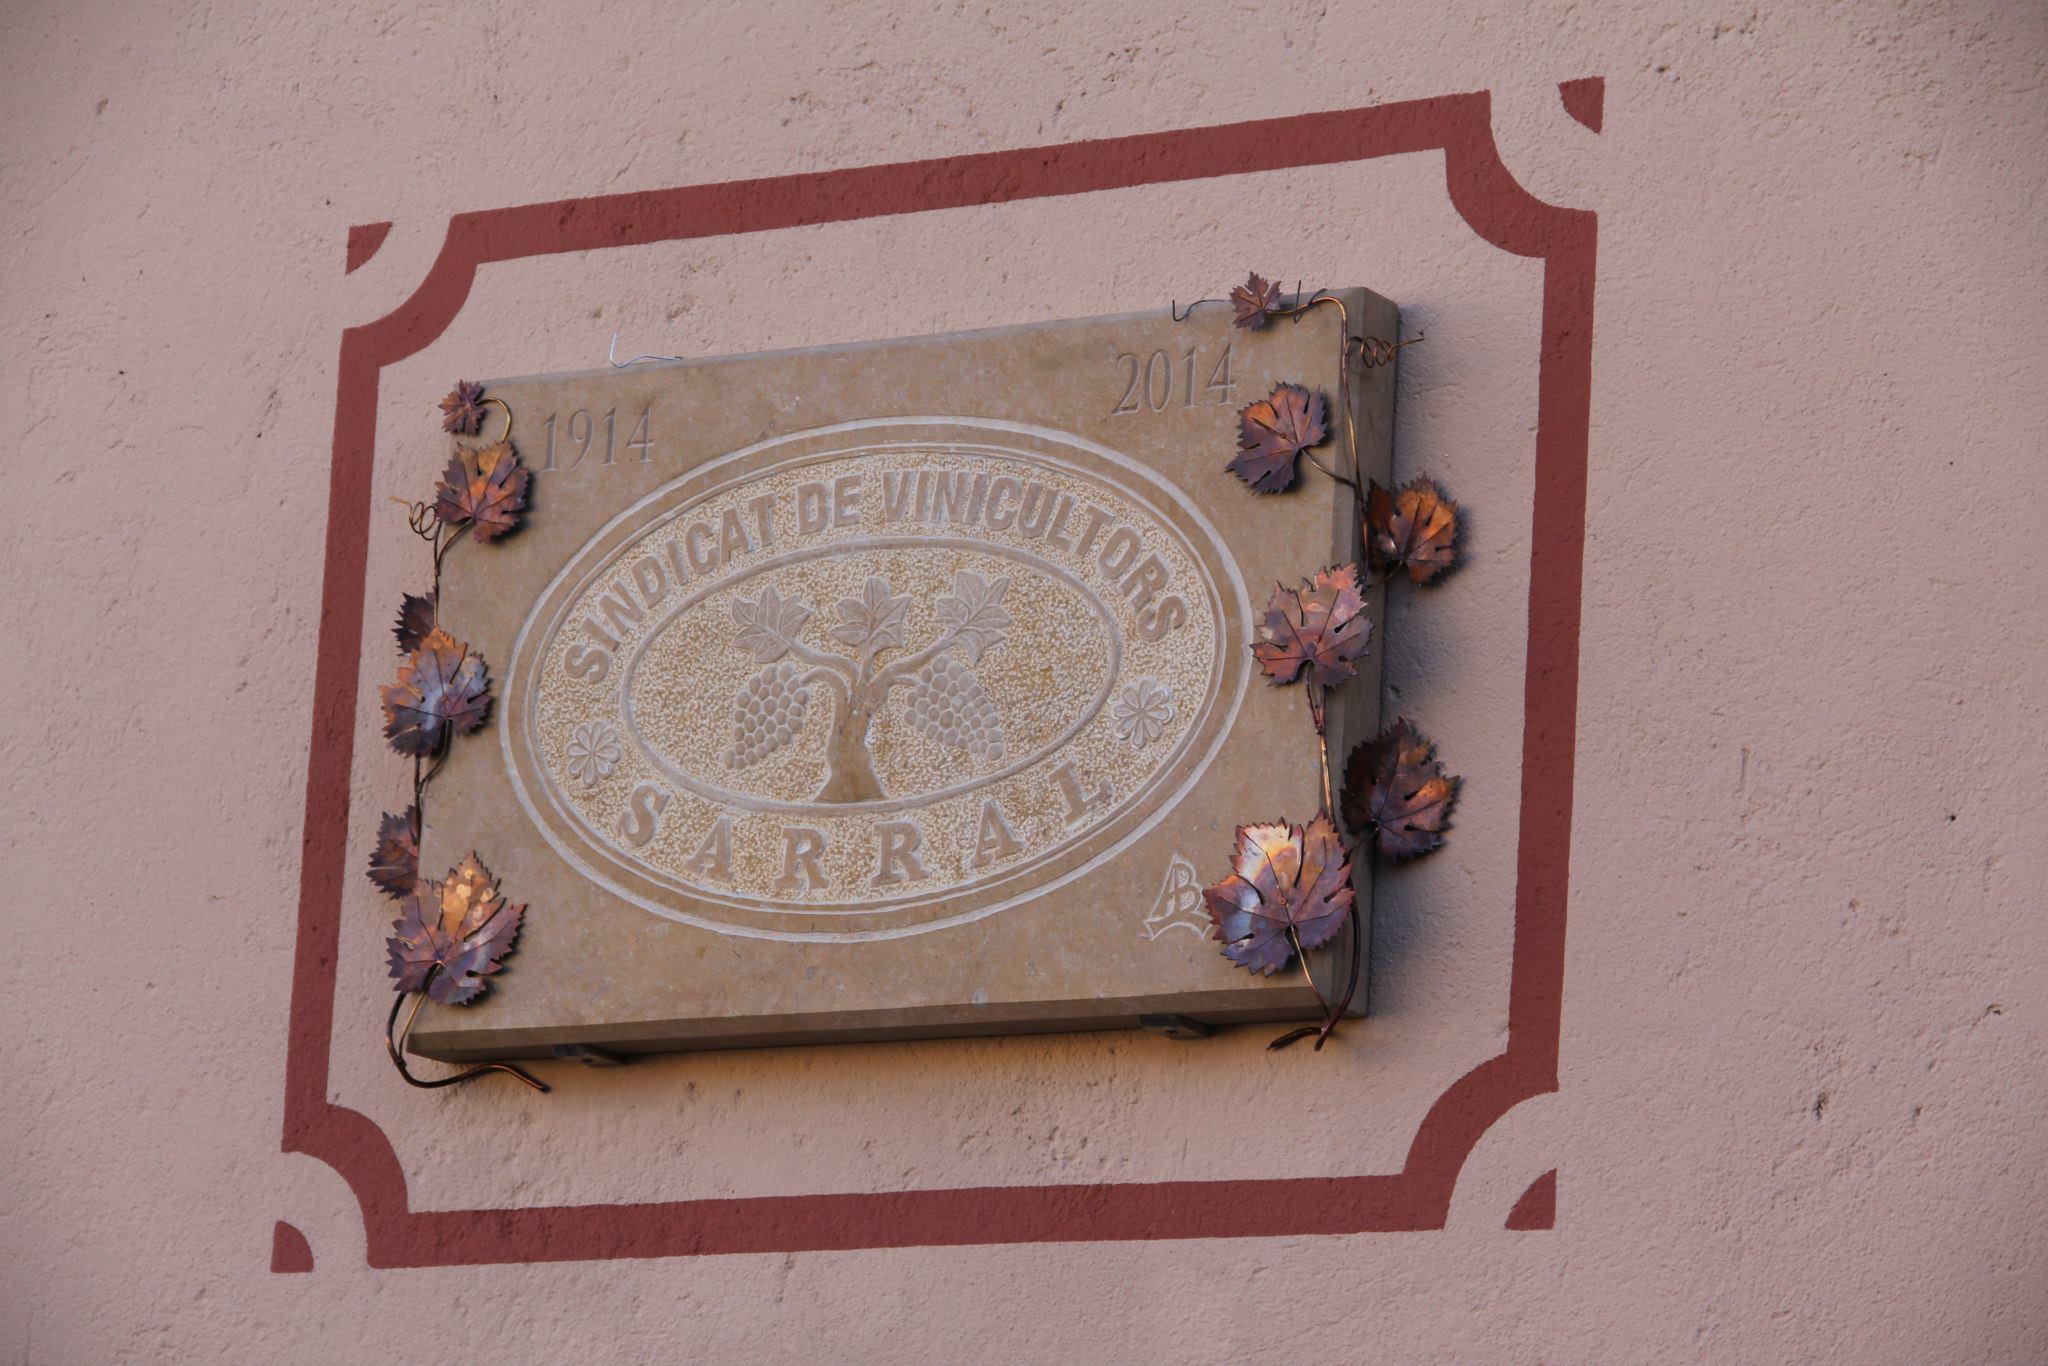 Weingut-Vinicola-de-Sarral-Portell-01